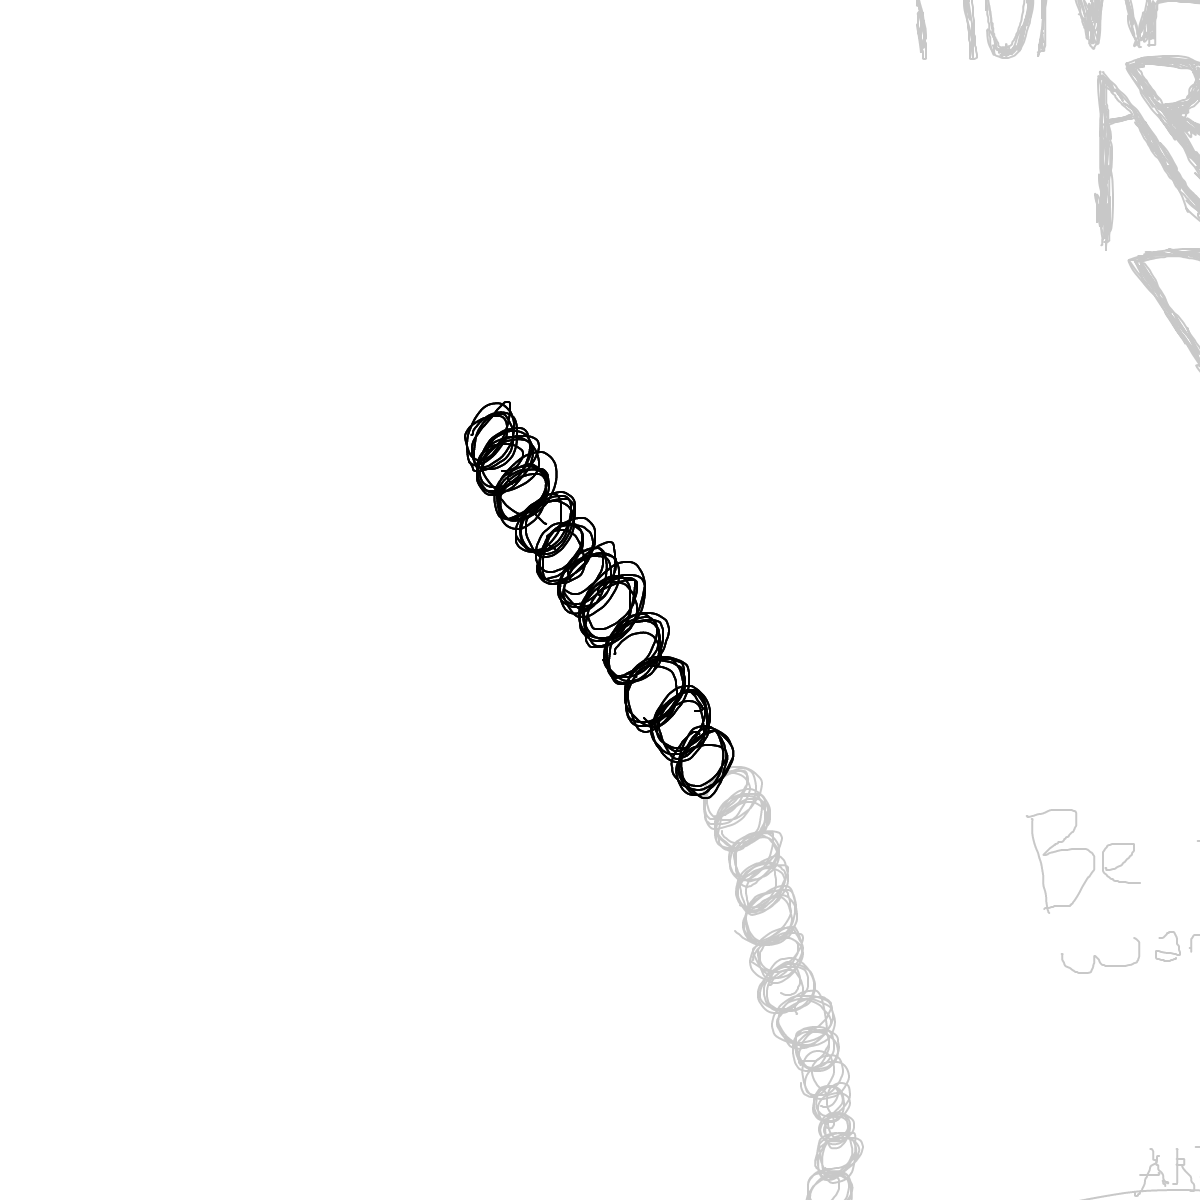 BAAAM drawing#9694 lat:52.4753303527832000lng: 13.4068565368652340